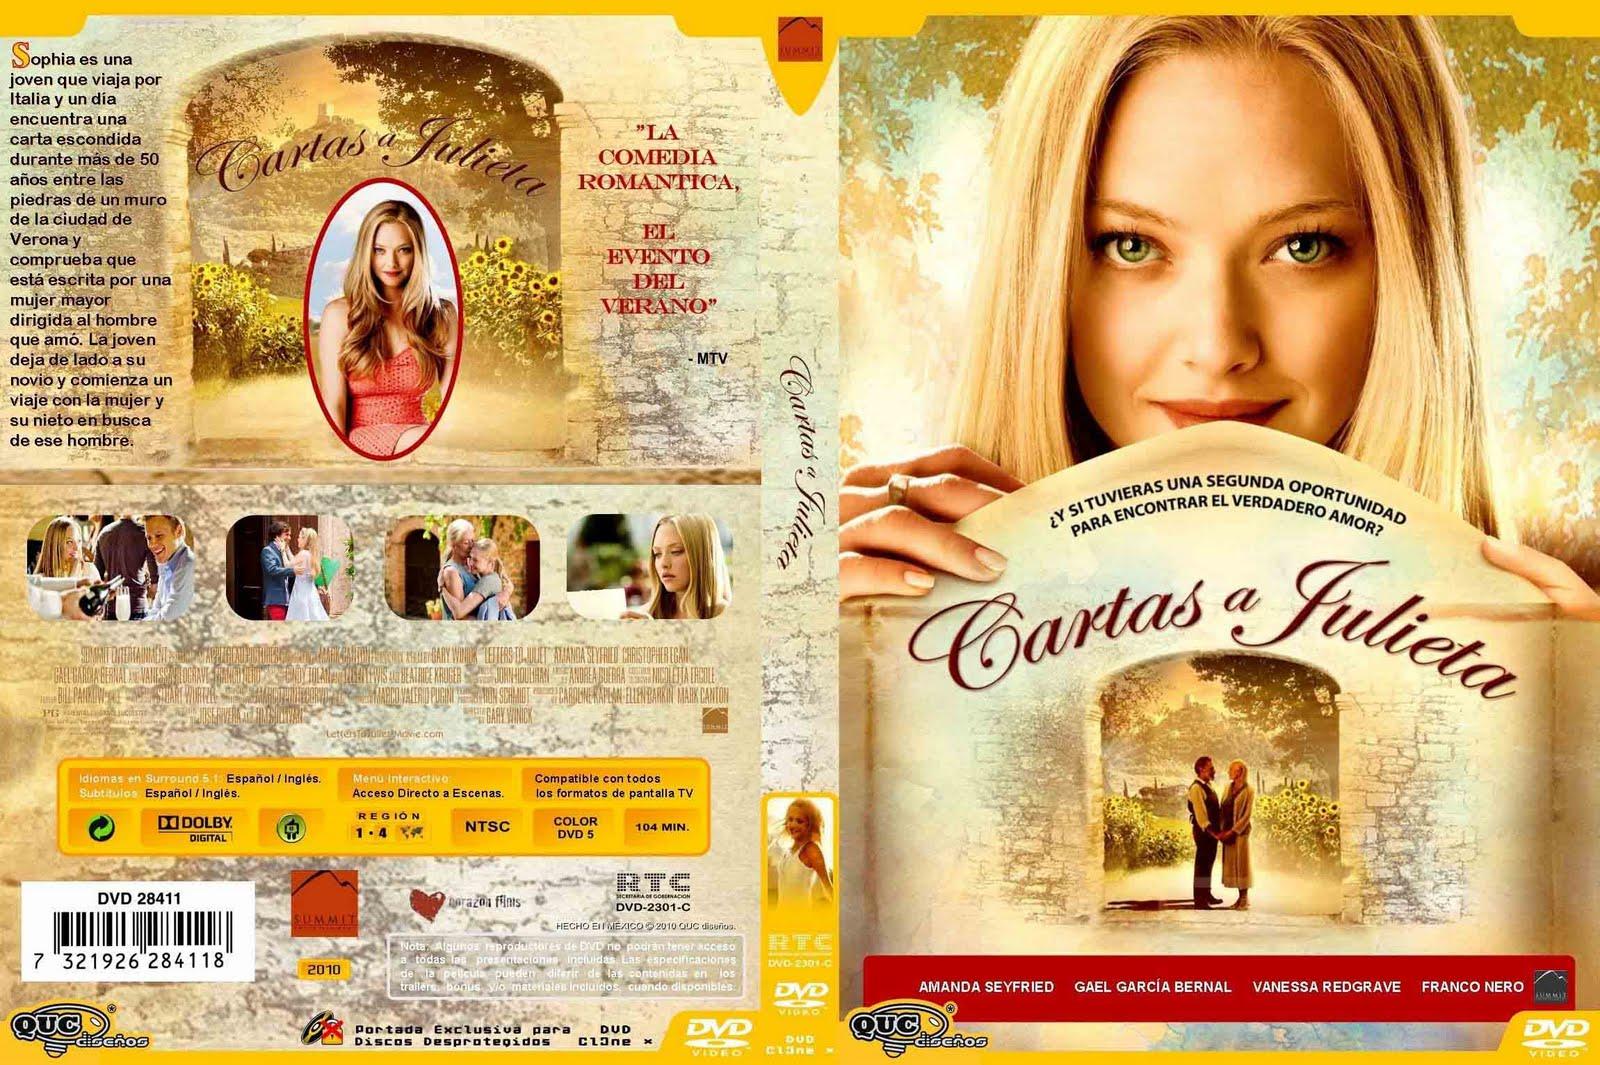 CINEFILOS2000: Cartas A Julieta (2010) Amanda Seyfried Imdb